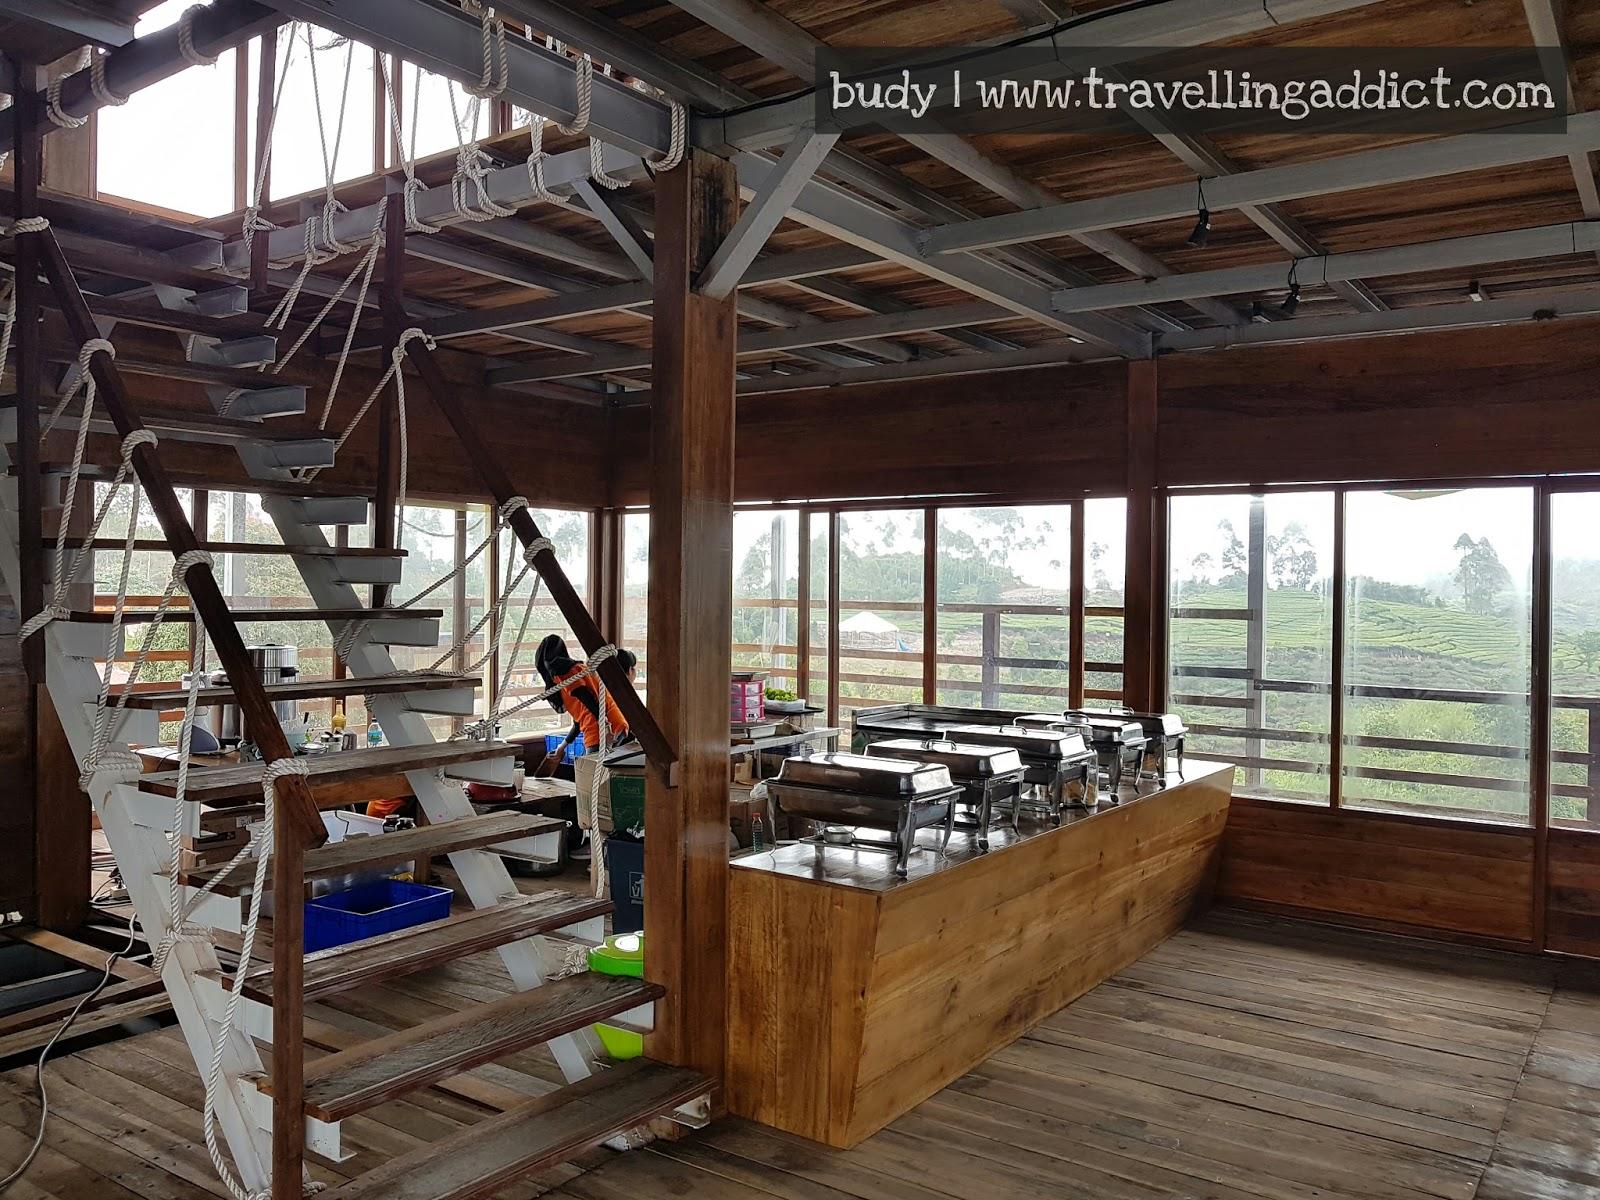 Bahtera Resto Tempat Makan Berkonsep Kapal Layar Rancabali Tapi Pinisi